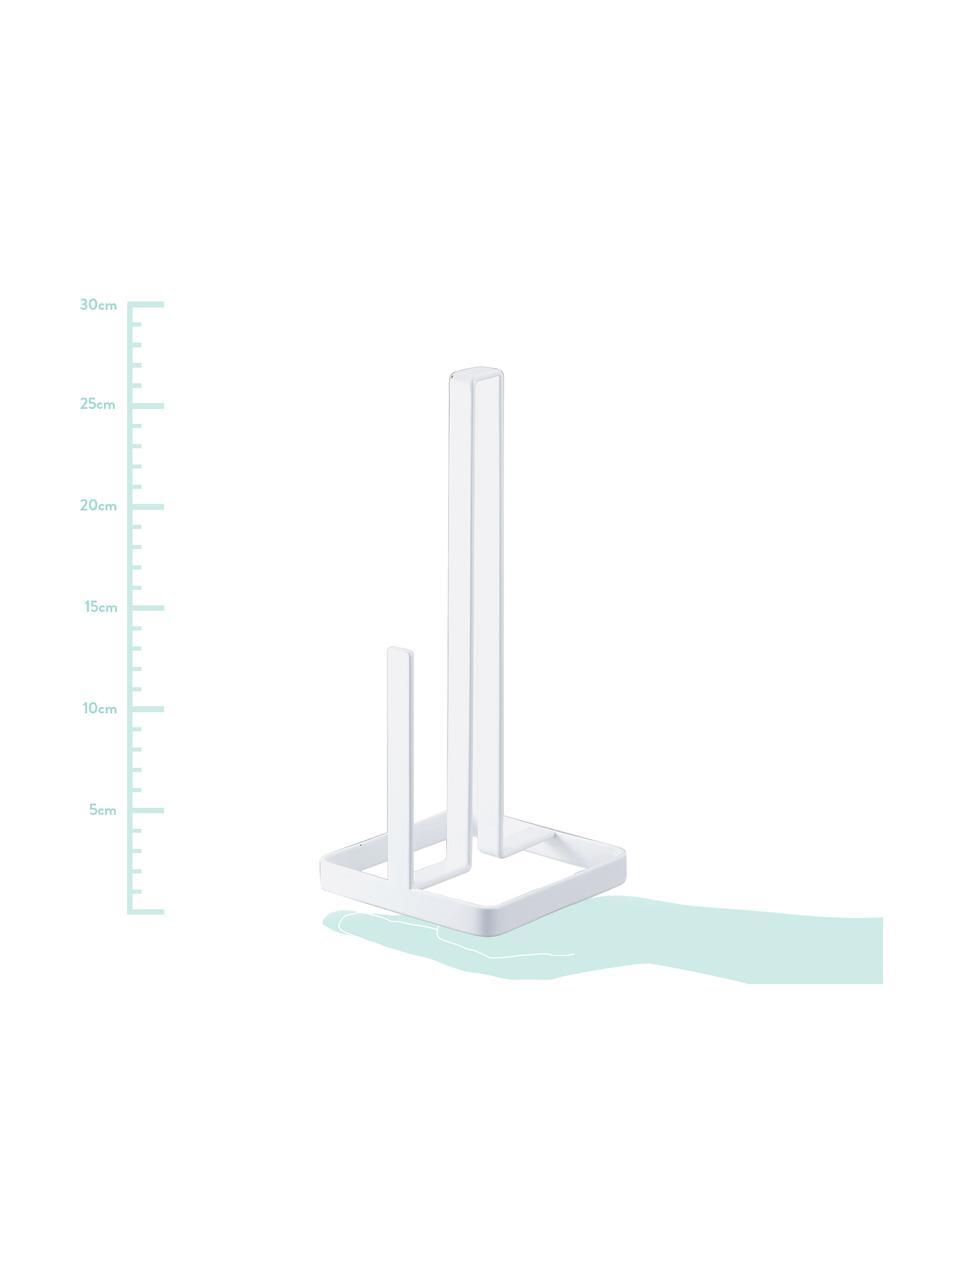 Portarotolo da cucina Tower, Acciaio rivestito, Bianco, Larg. 11 x Alt. 27 cm